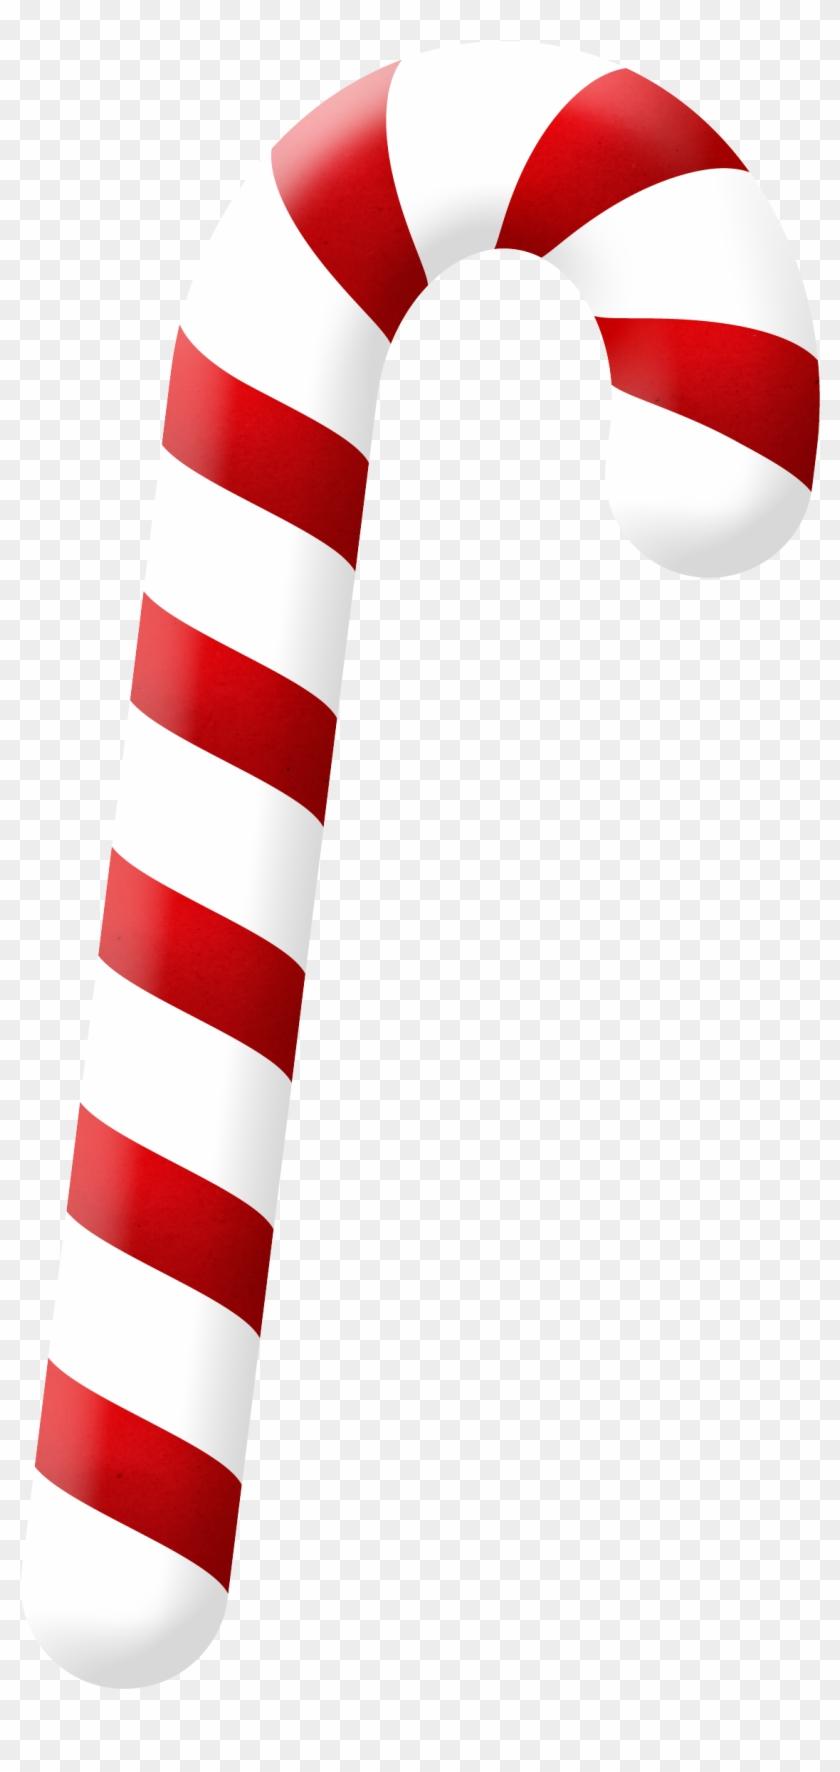 Christmas Candy Cane Clip Art - Christmas Candy Cane #229966